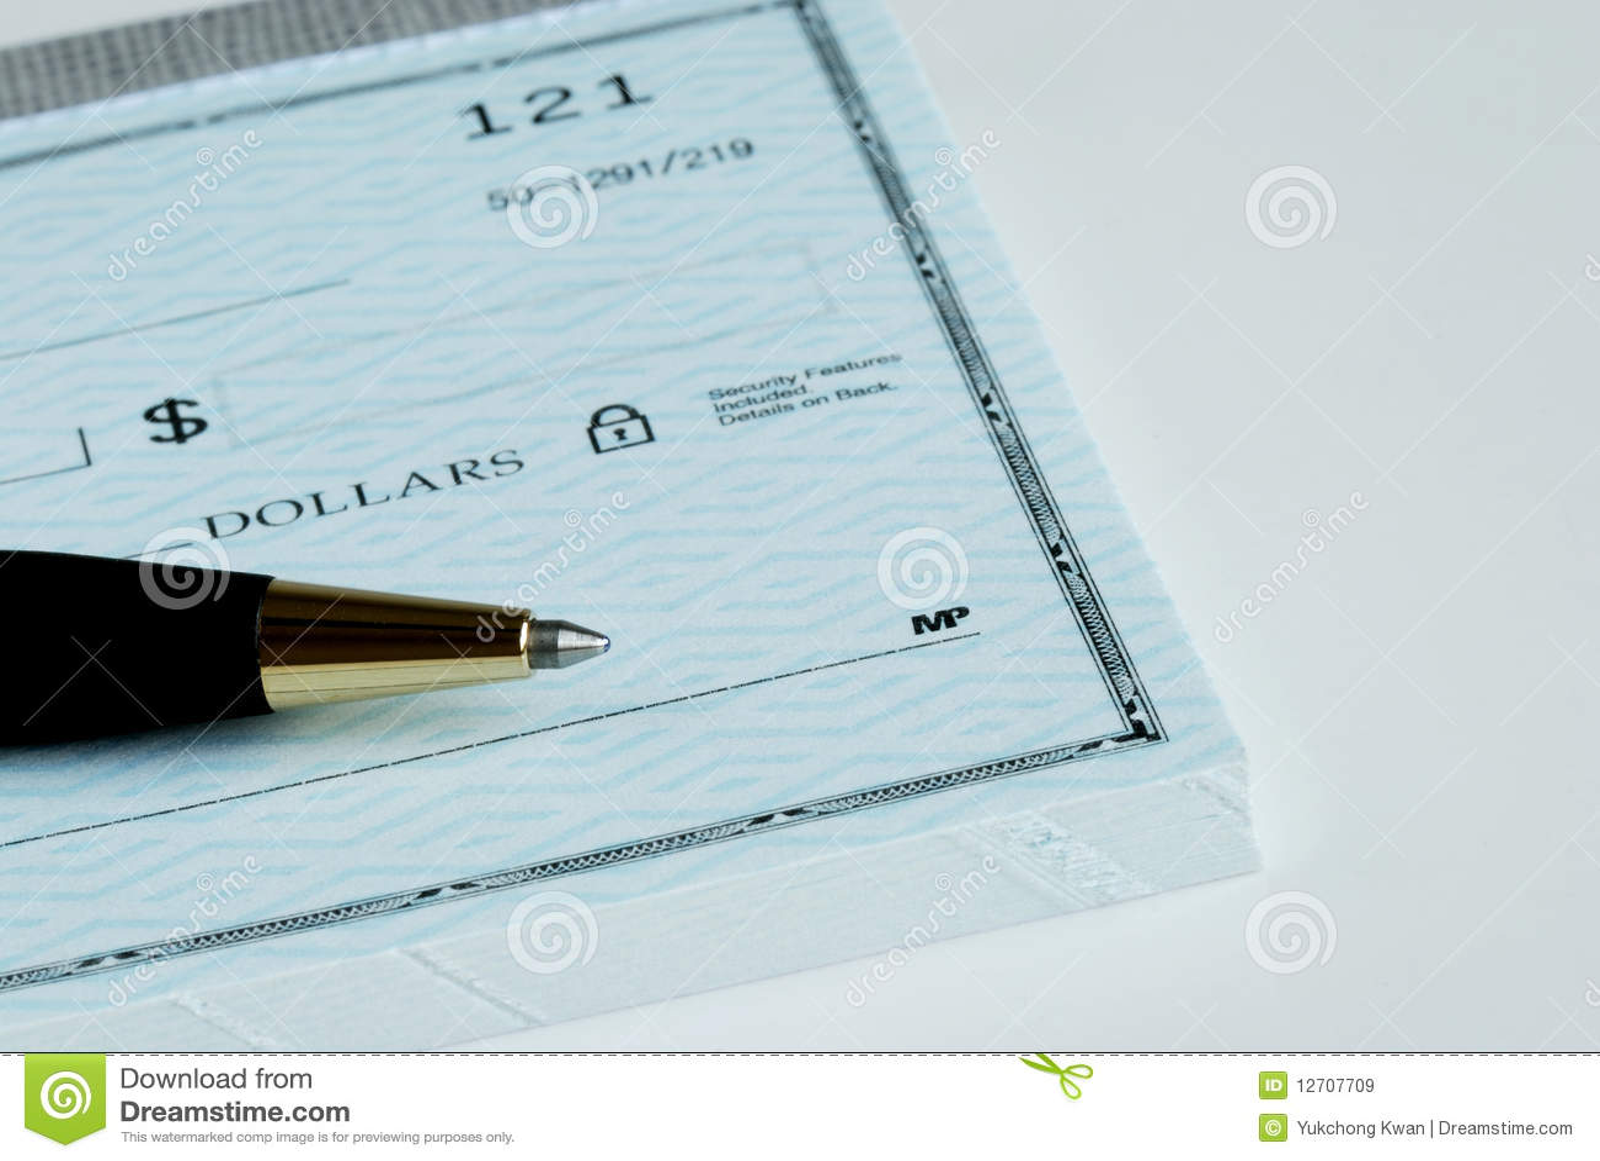 writing check amount Discussthe6partsofwritingacheck: thecheckamountisrecordedinthecheck_____ 2 i checking unit.